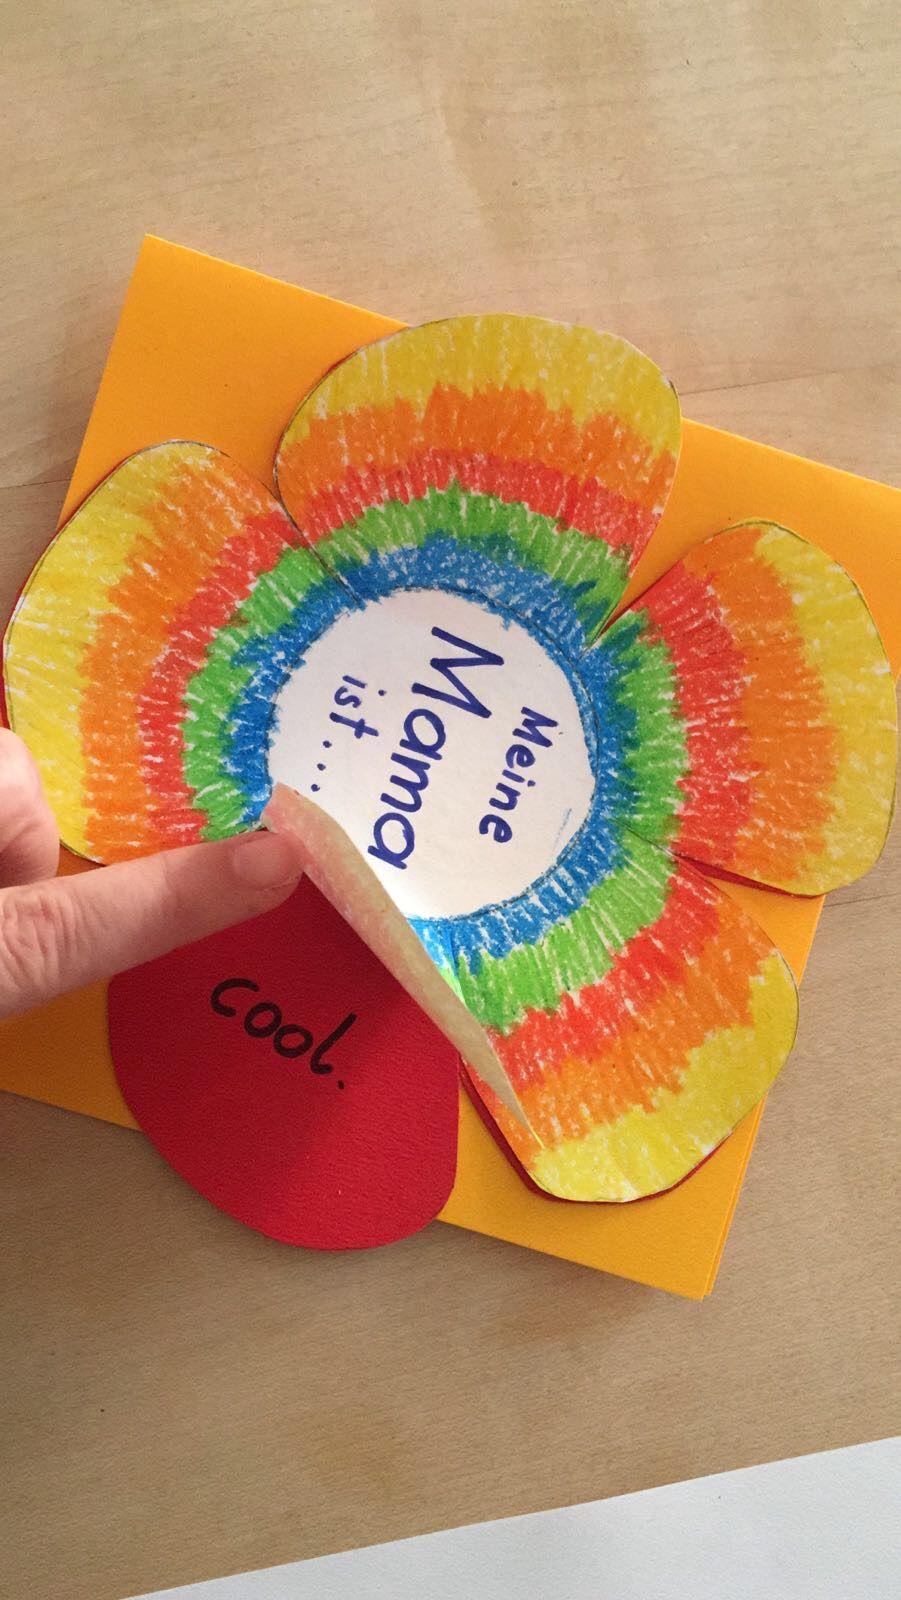 Muttertag / Adjektive  Muttertag basteln ideen, Muttertag